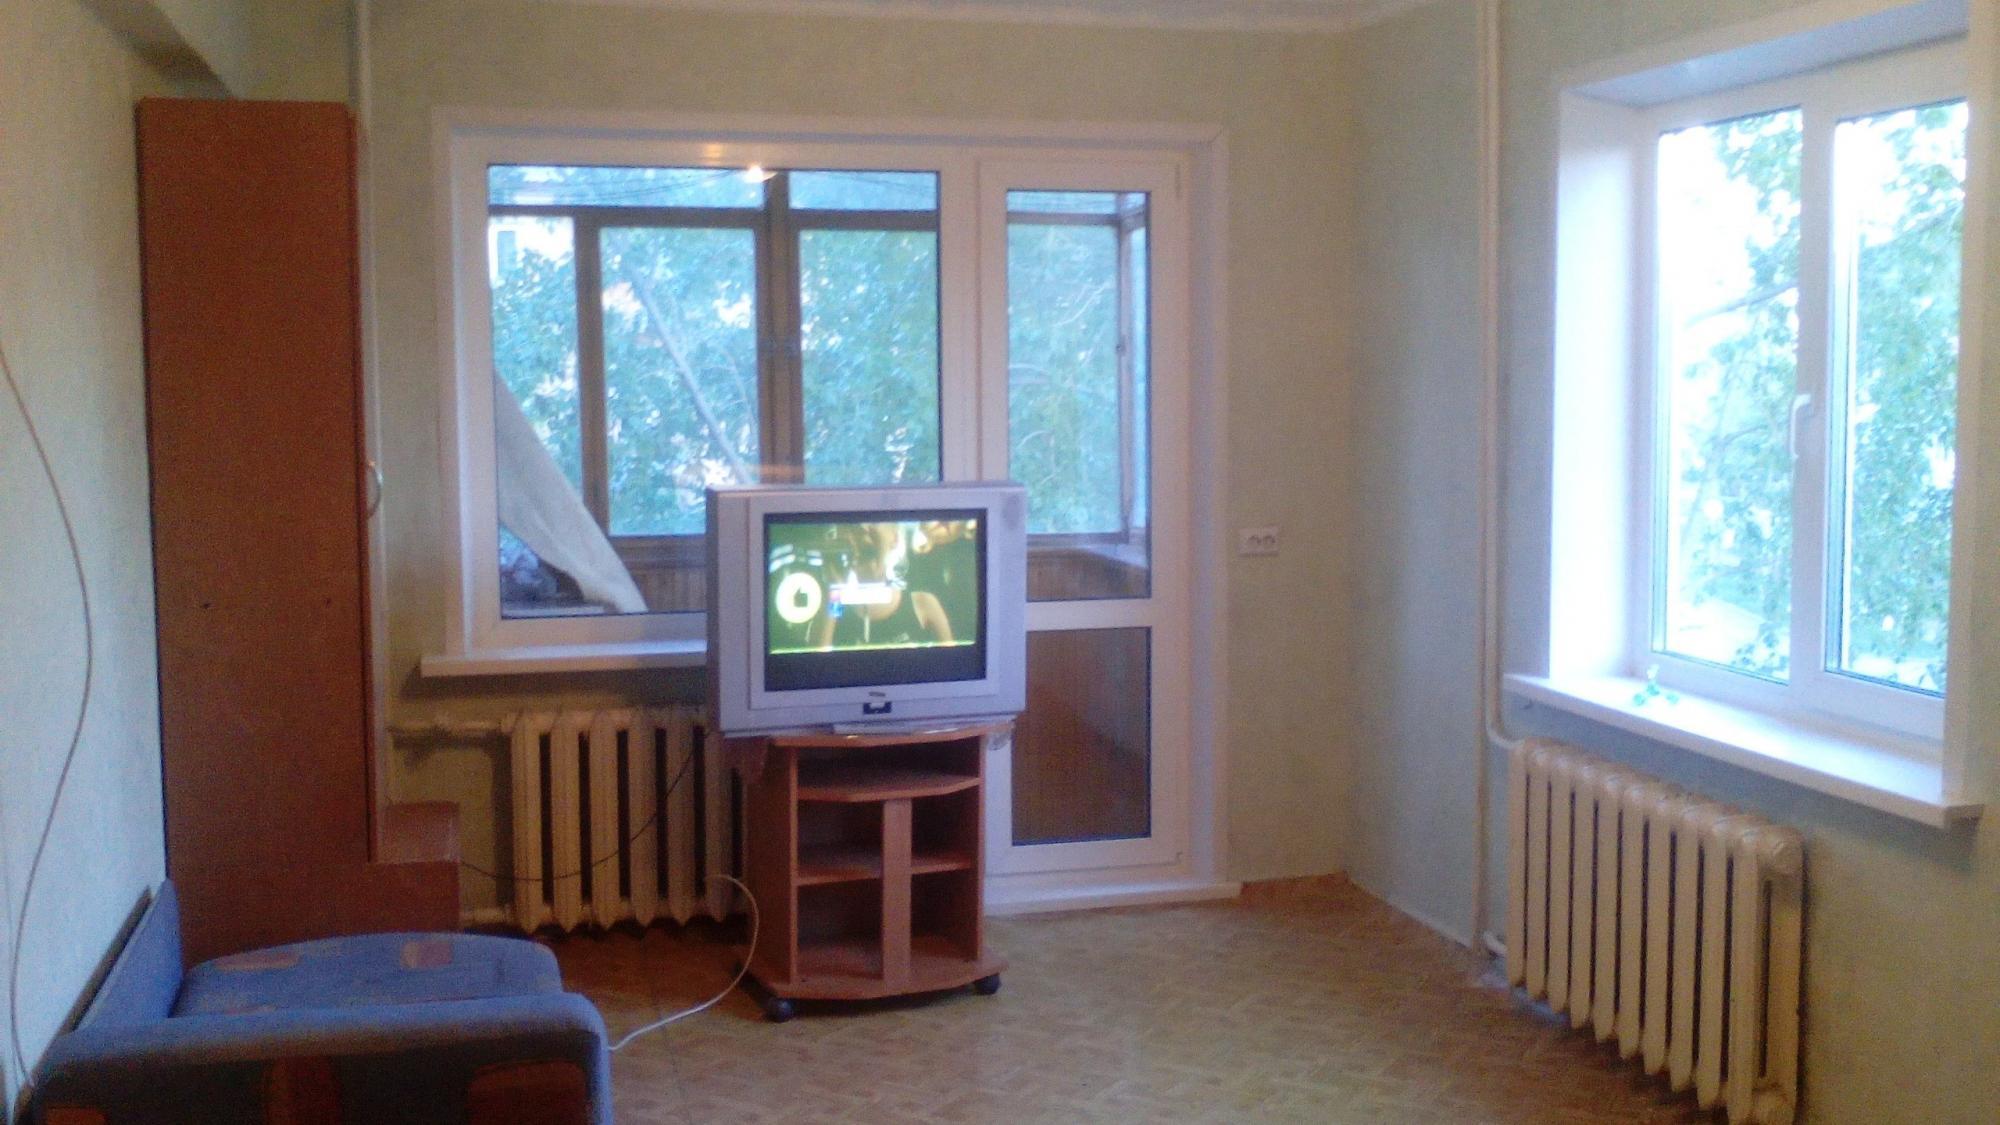 1к квартира Кольцевая улица, 24 | 13500 | аренда в Красноярске фото 6